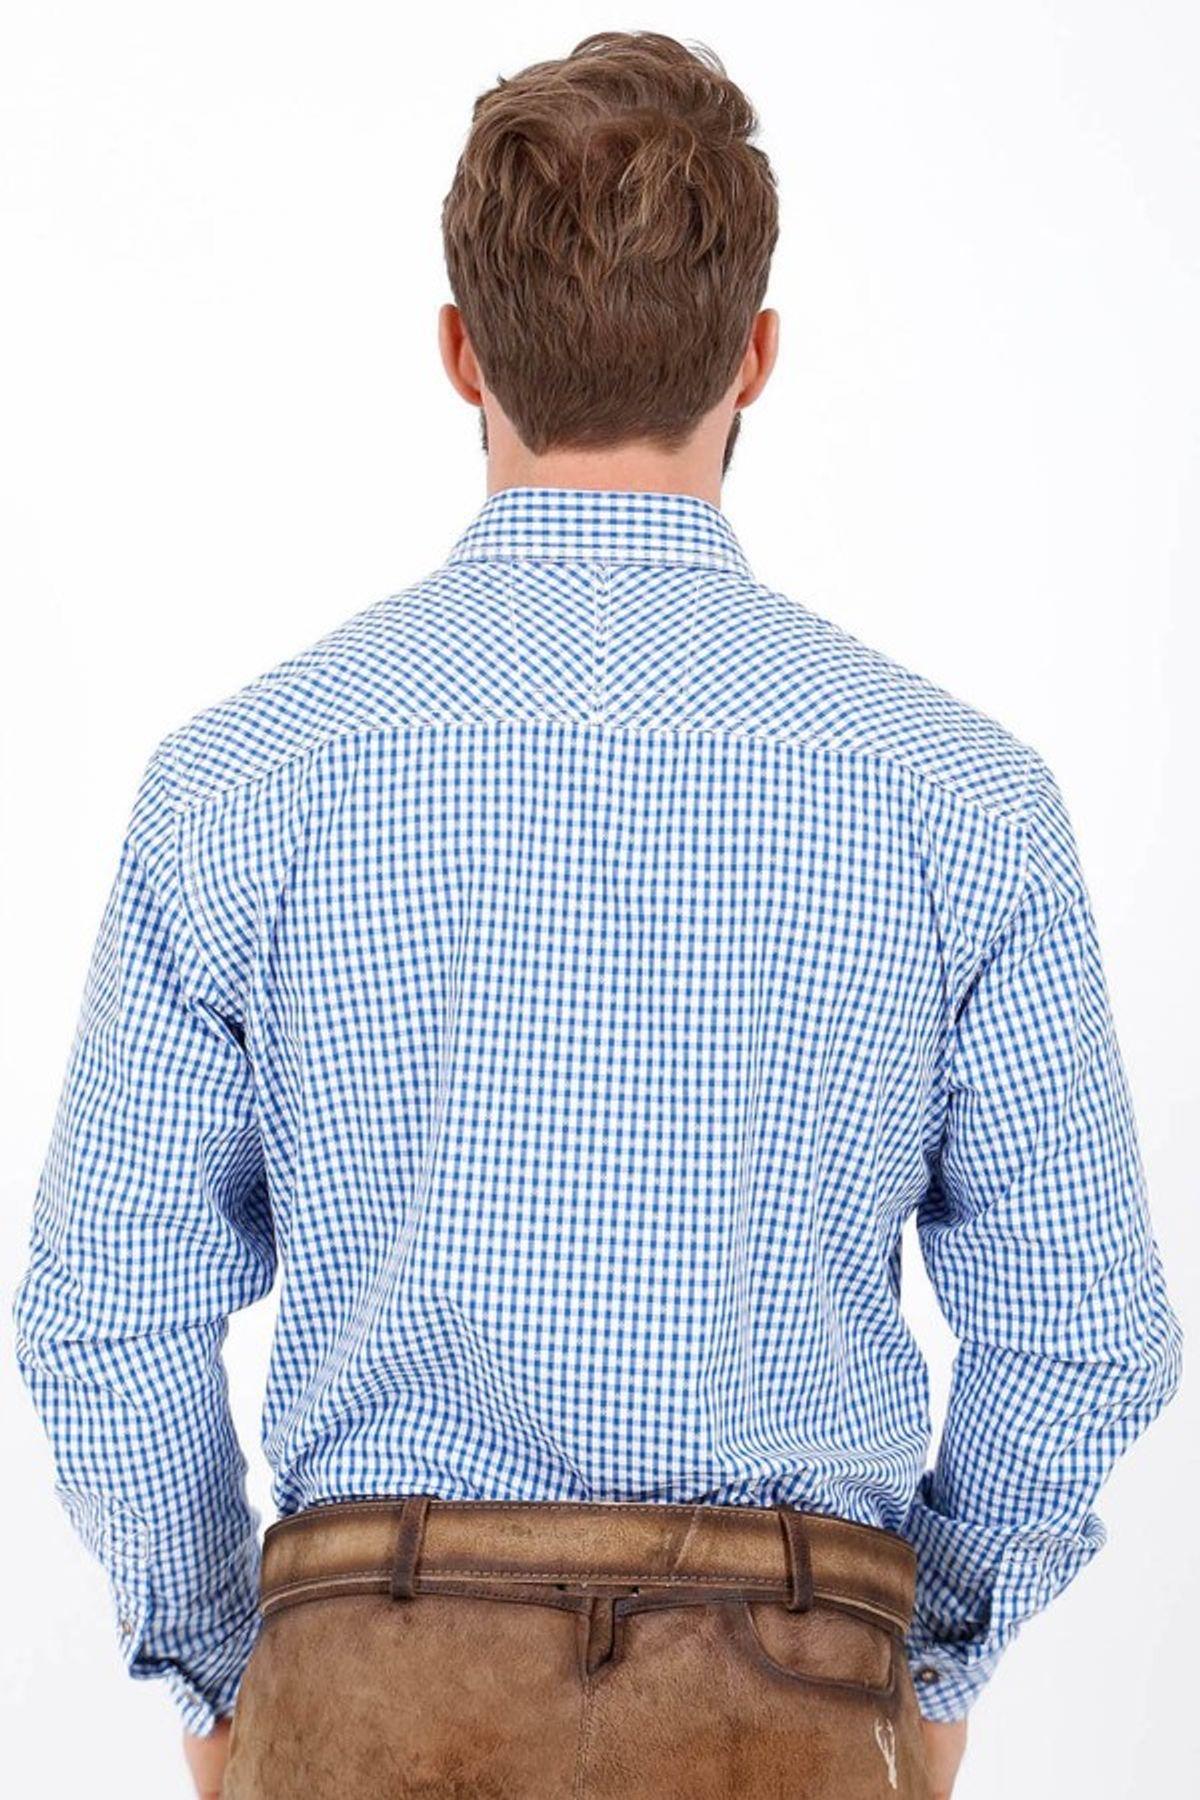 Krüger - Herren Trachtenhemd in blau, Ben (95104-8) – Bild 6